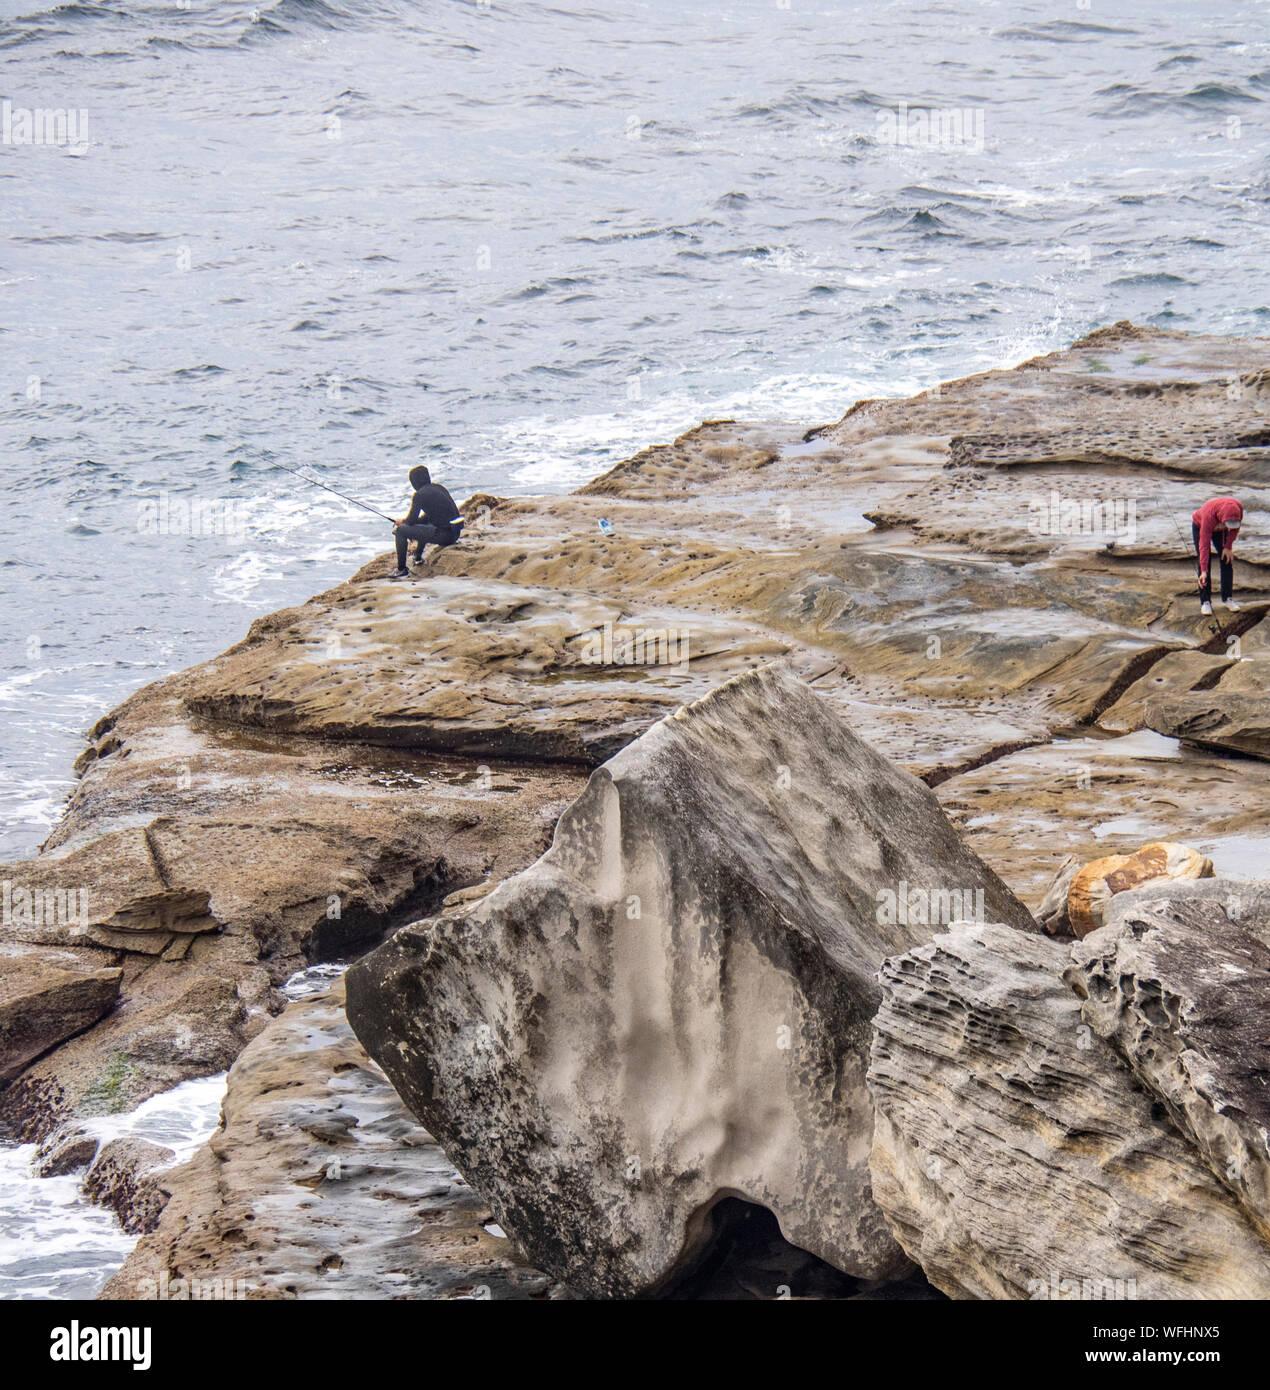 Two men rock fishing of rocks at Manly Headland Sydney NSW Australia. Stock Photo